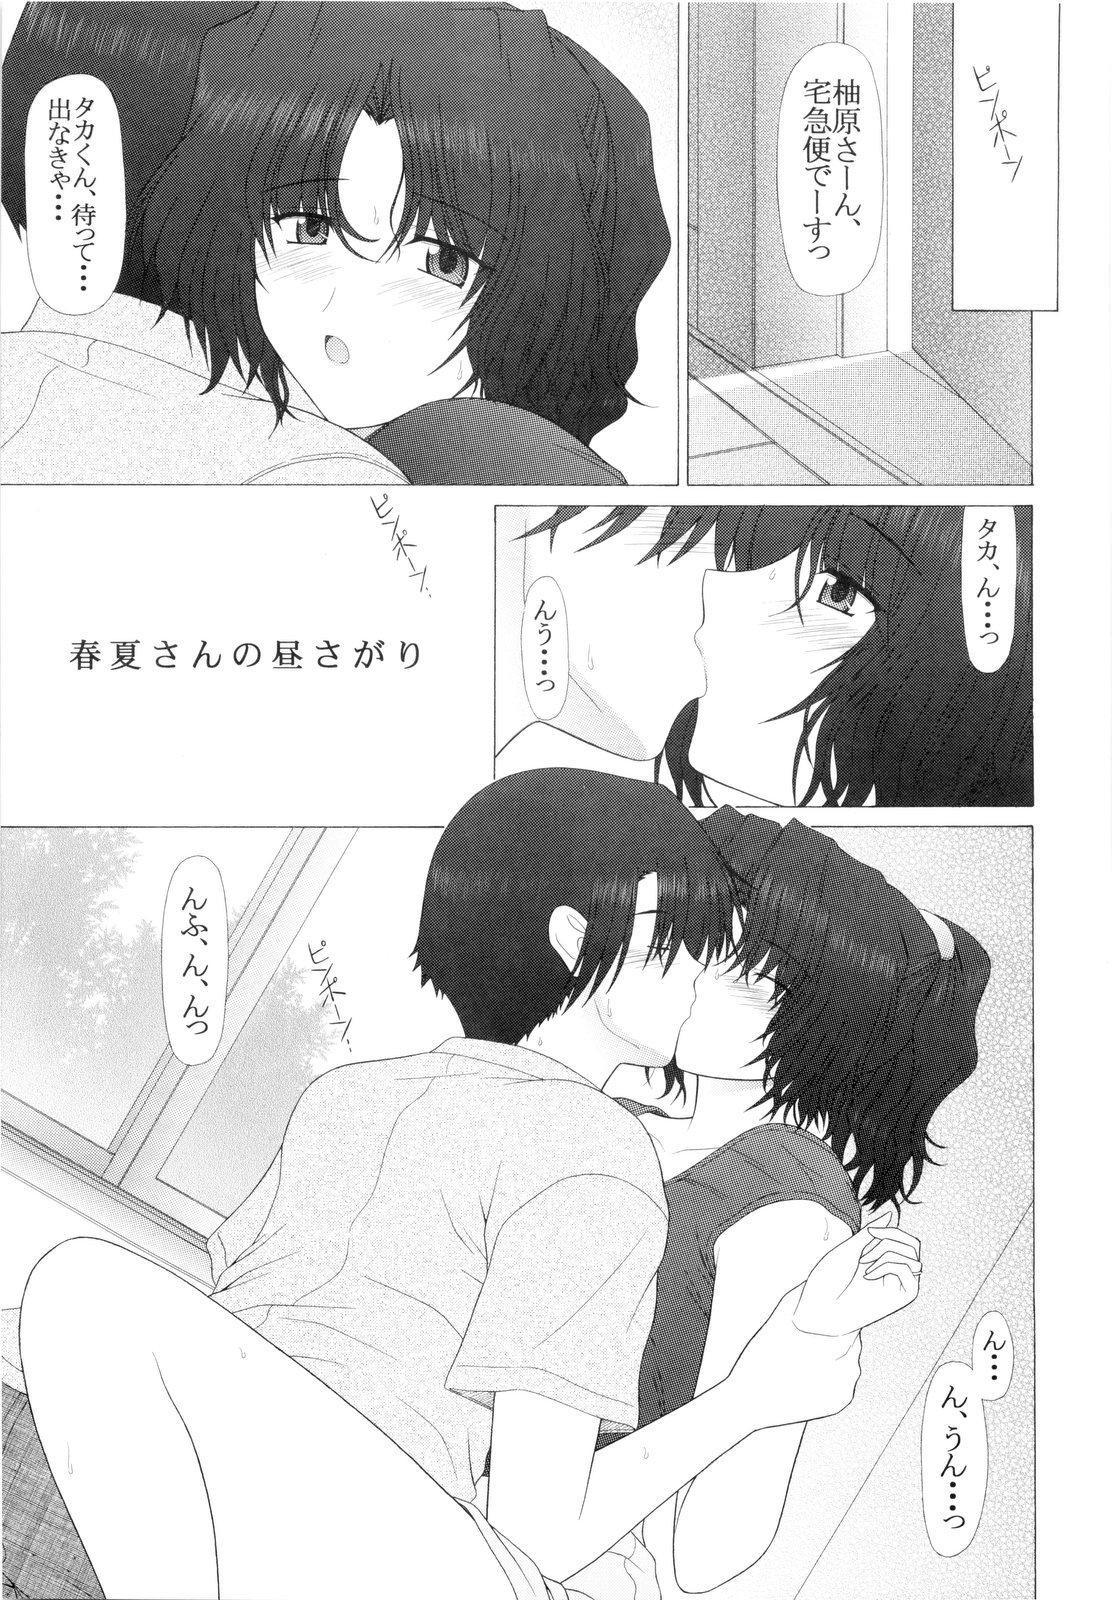 PURE NEXT GENERATION Vol.15 Haruka-san no Hirusagari 4